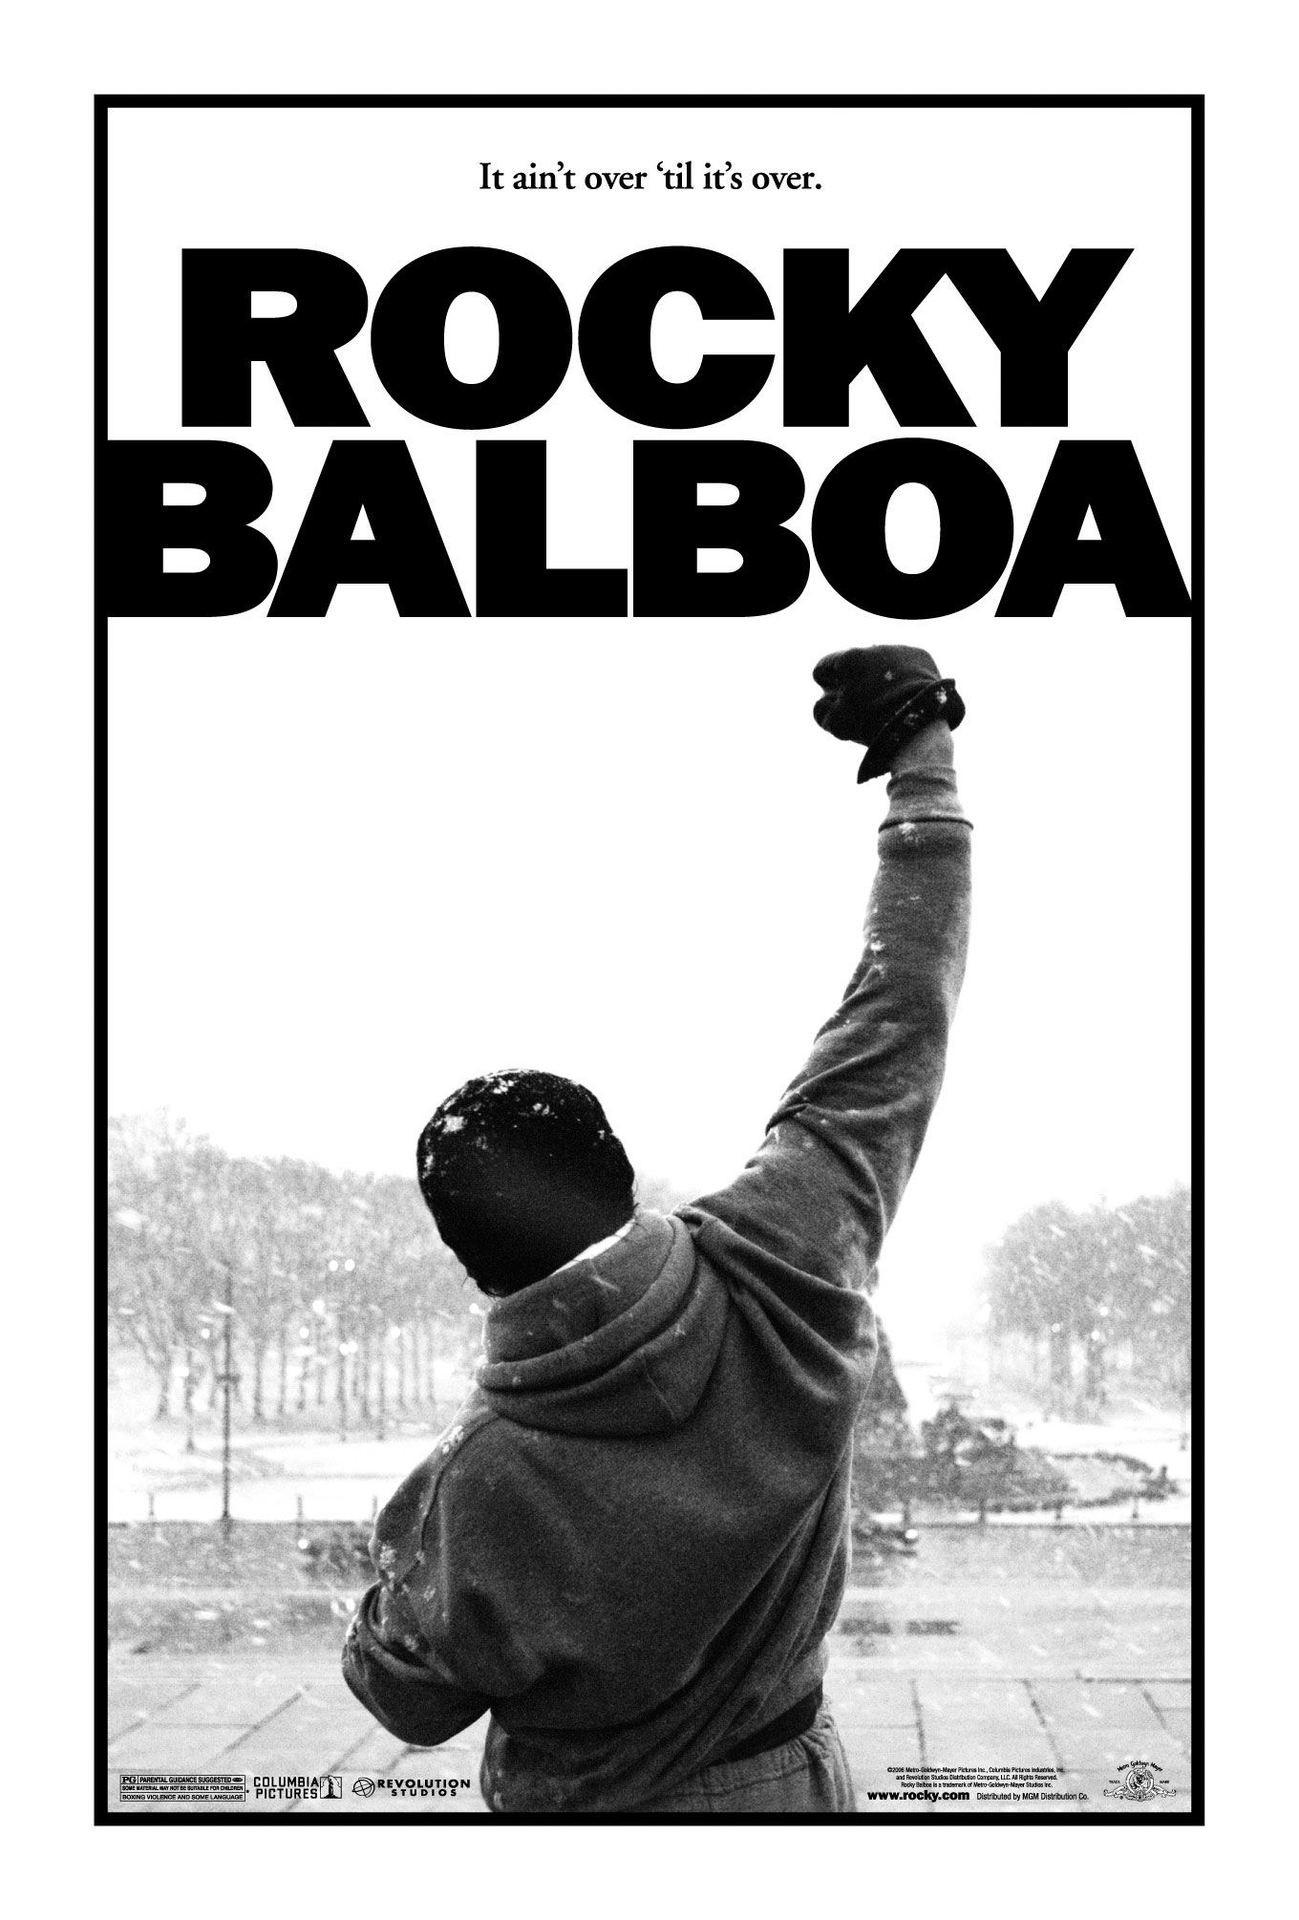 Rocky Balboa Wallpaper Hd 62 Images